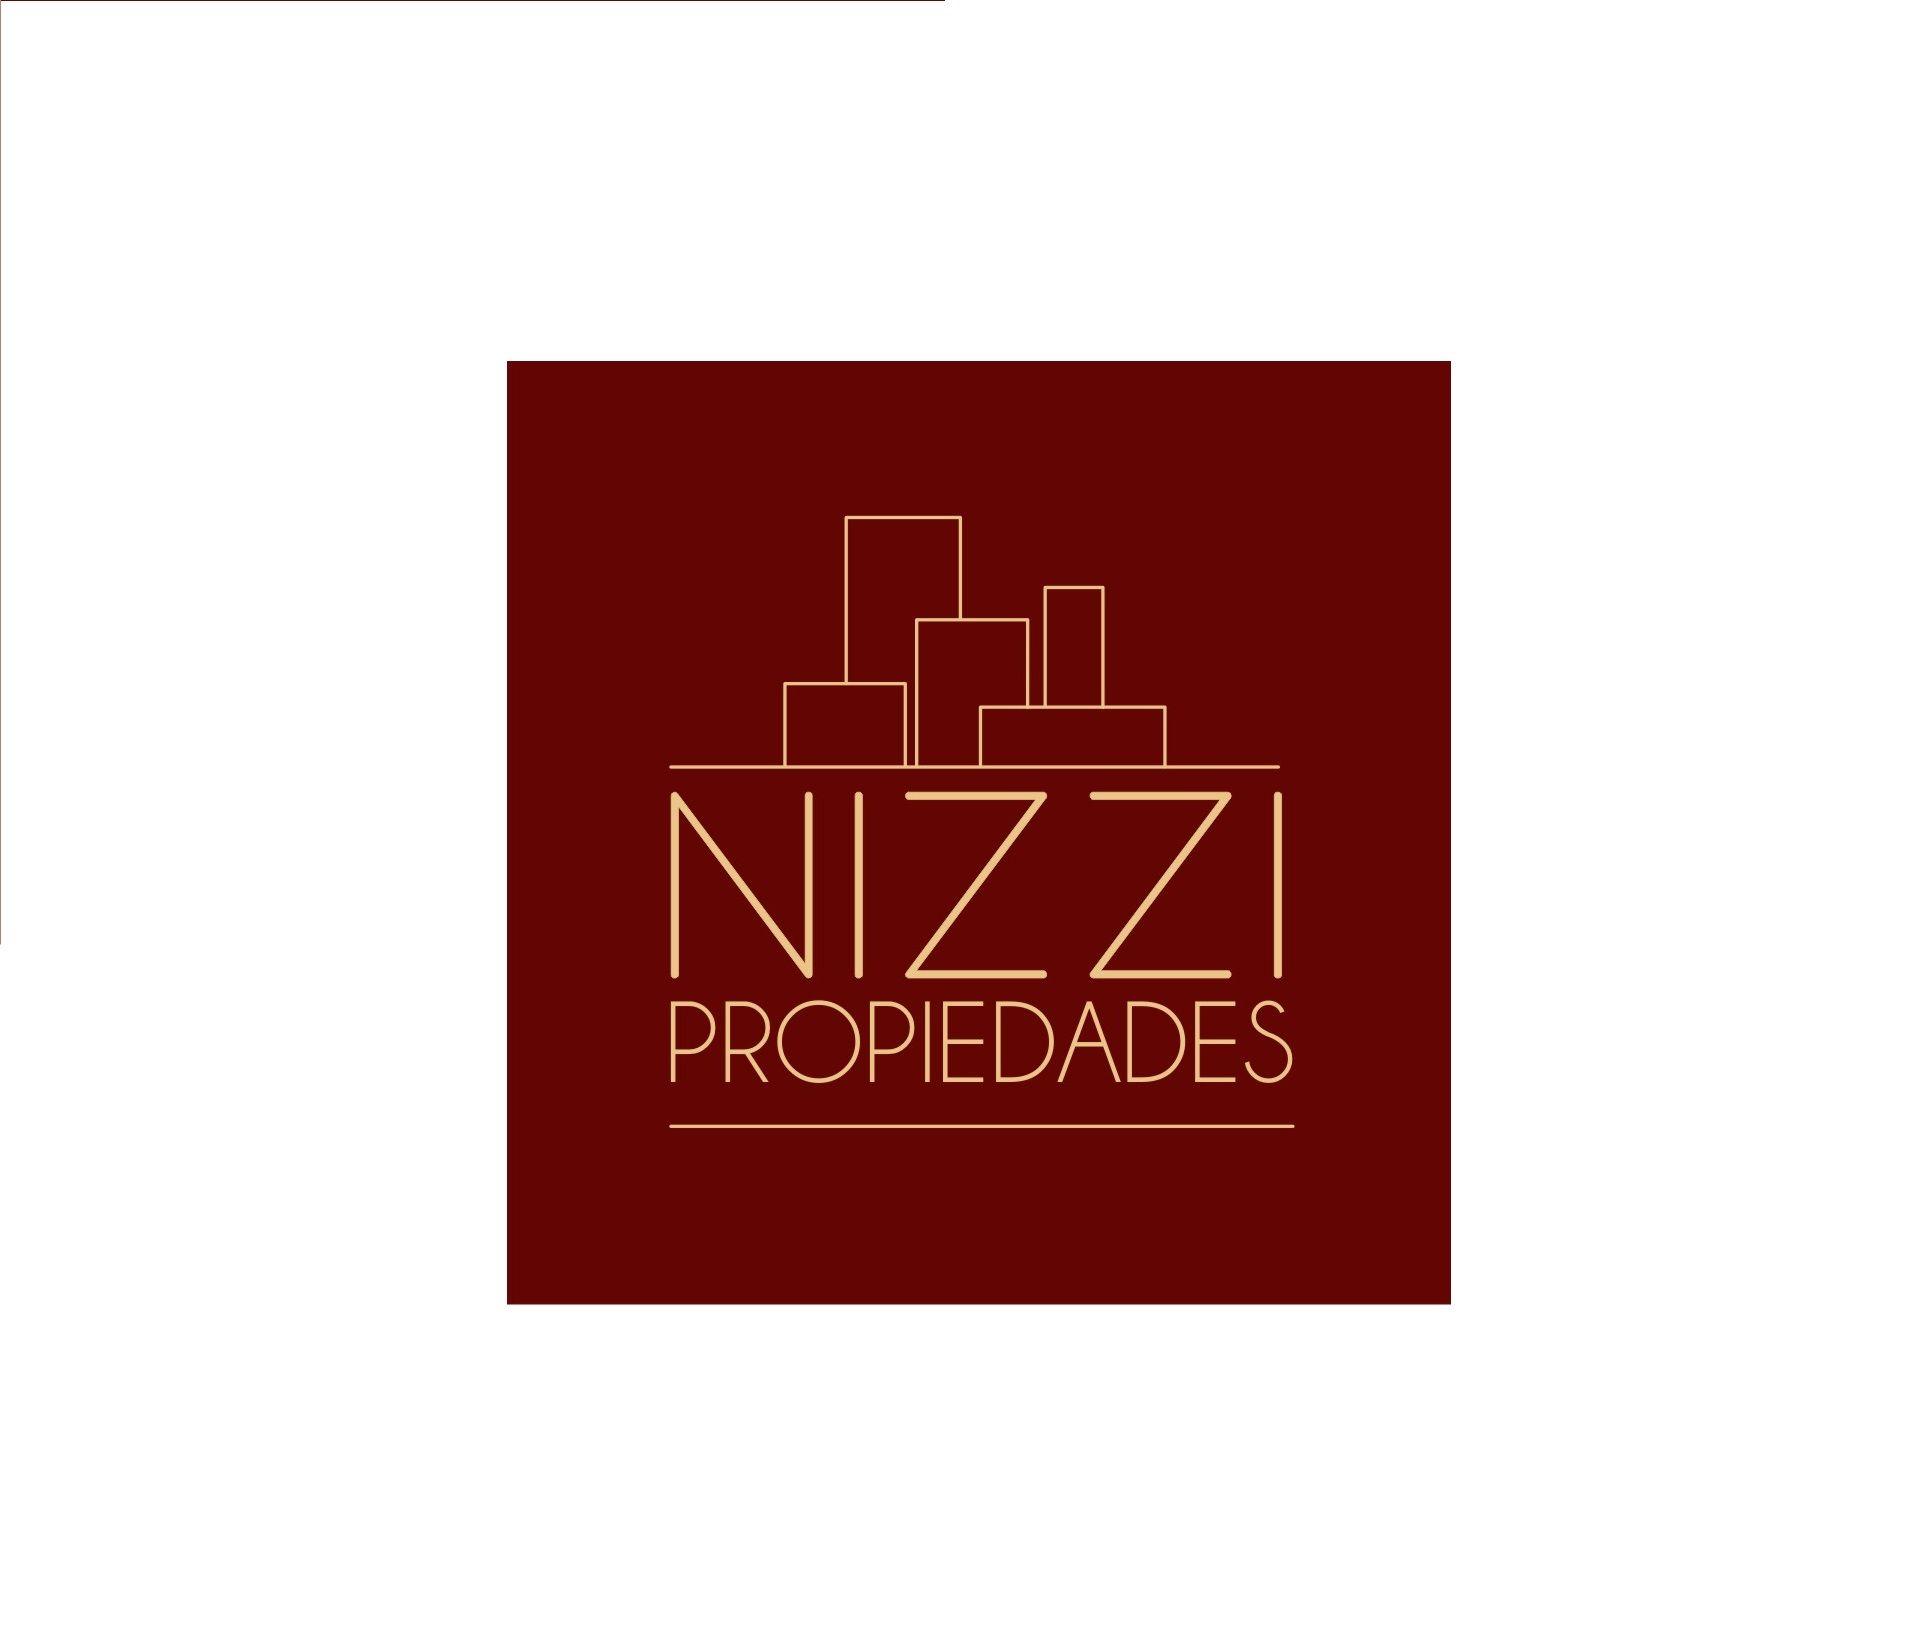 Logo de  Nizzi Propiedades